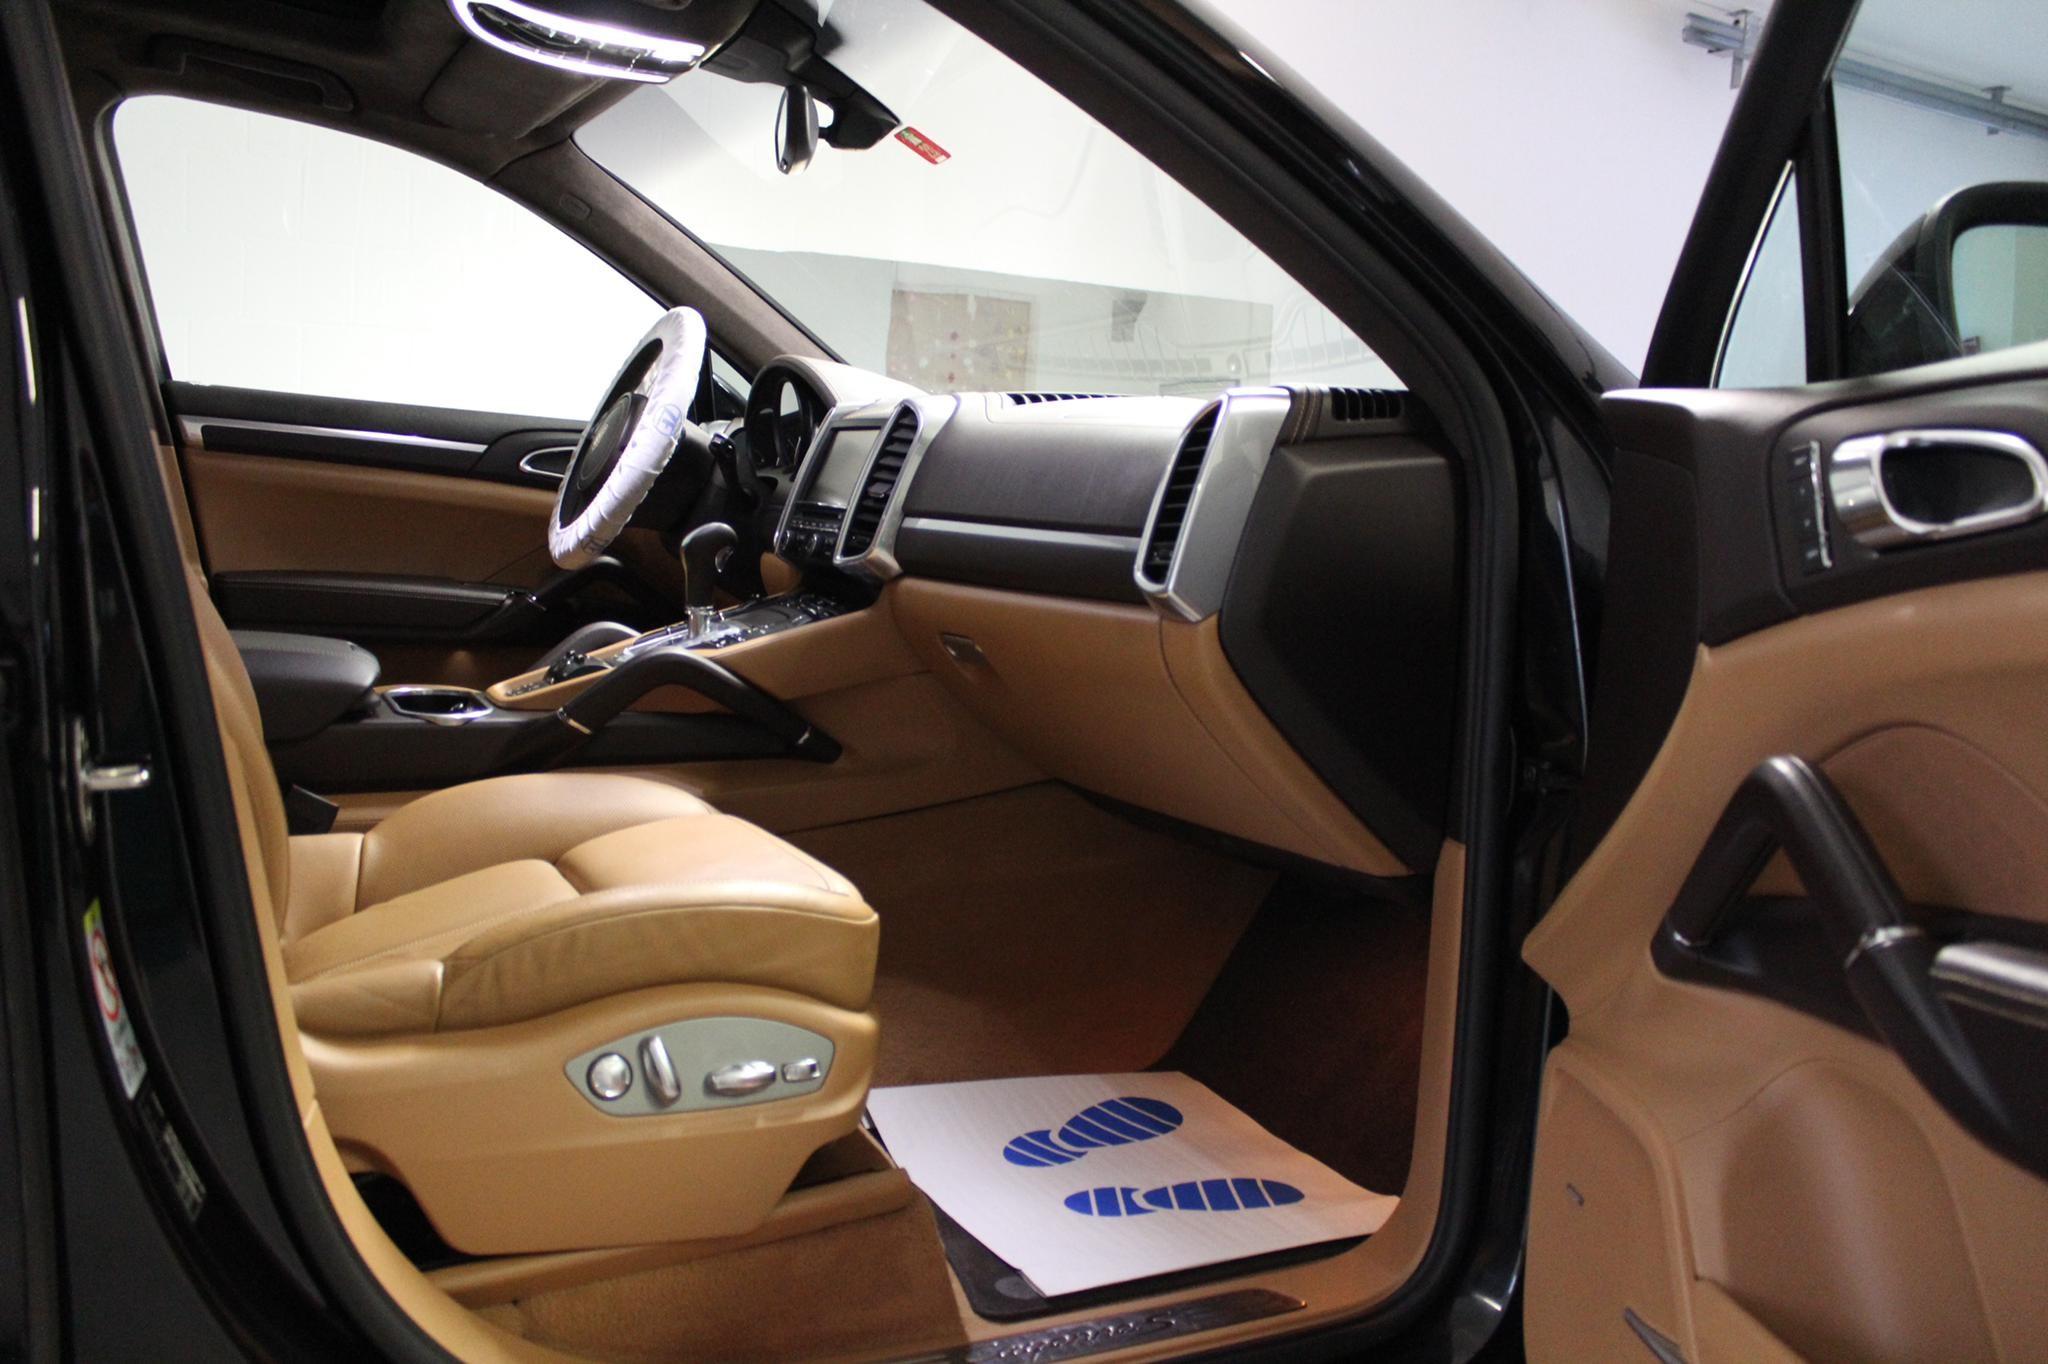 Porsche Cayenne 4.8 V8 S TipT